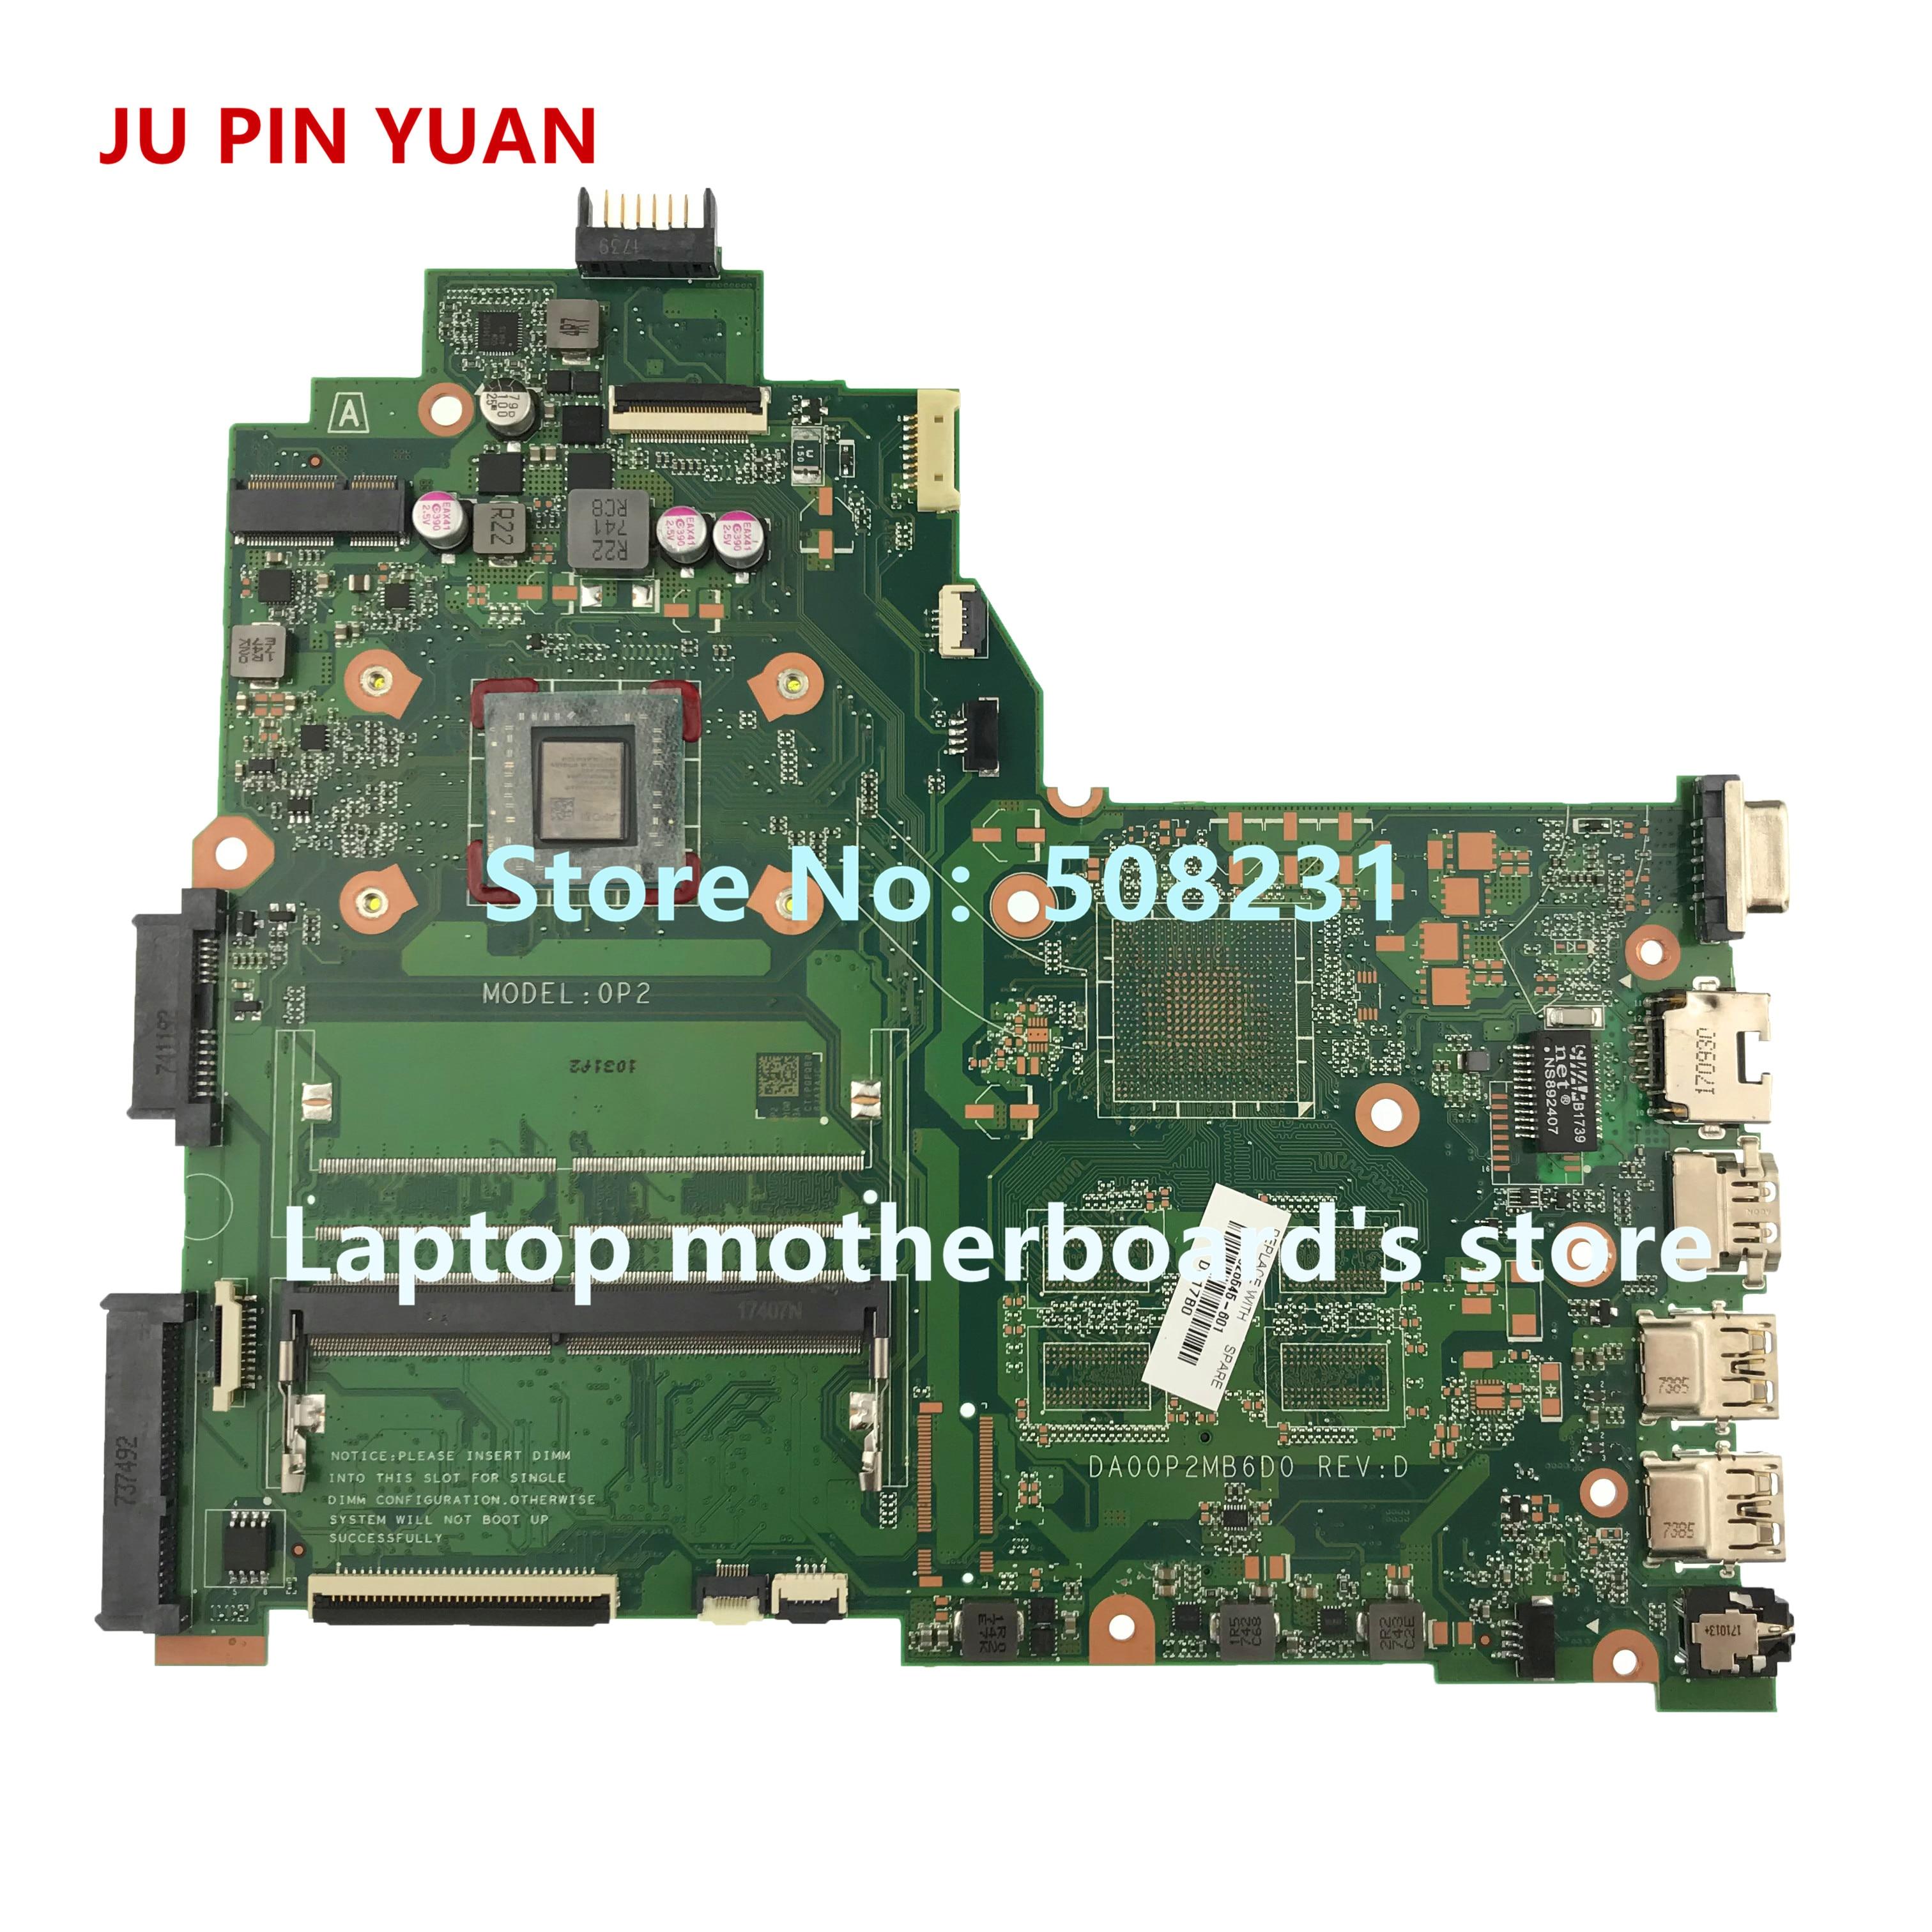 JU PIN YUAN  925525-601 0P2 DA00P2MB6D0 Laptop motherboard For HP 240 G6 Laptop 14-BW Notebook PC E2-9000 fully TestedJU PIN YUAN  925525-601 0P2 DA00P2MB6D0 Laptop motherboard For HP 240 G6 Laptop 14-BW Notebook PC E2-9000 fully Tested